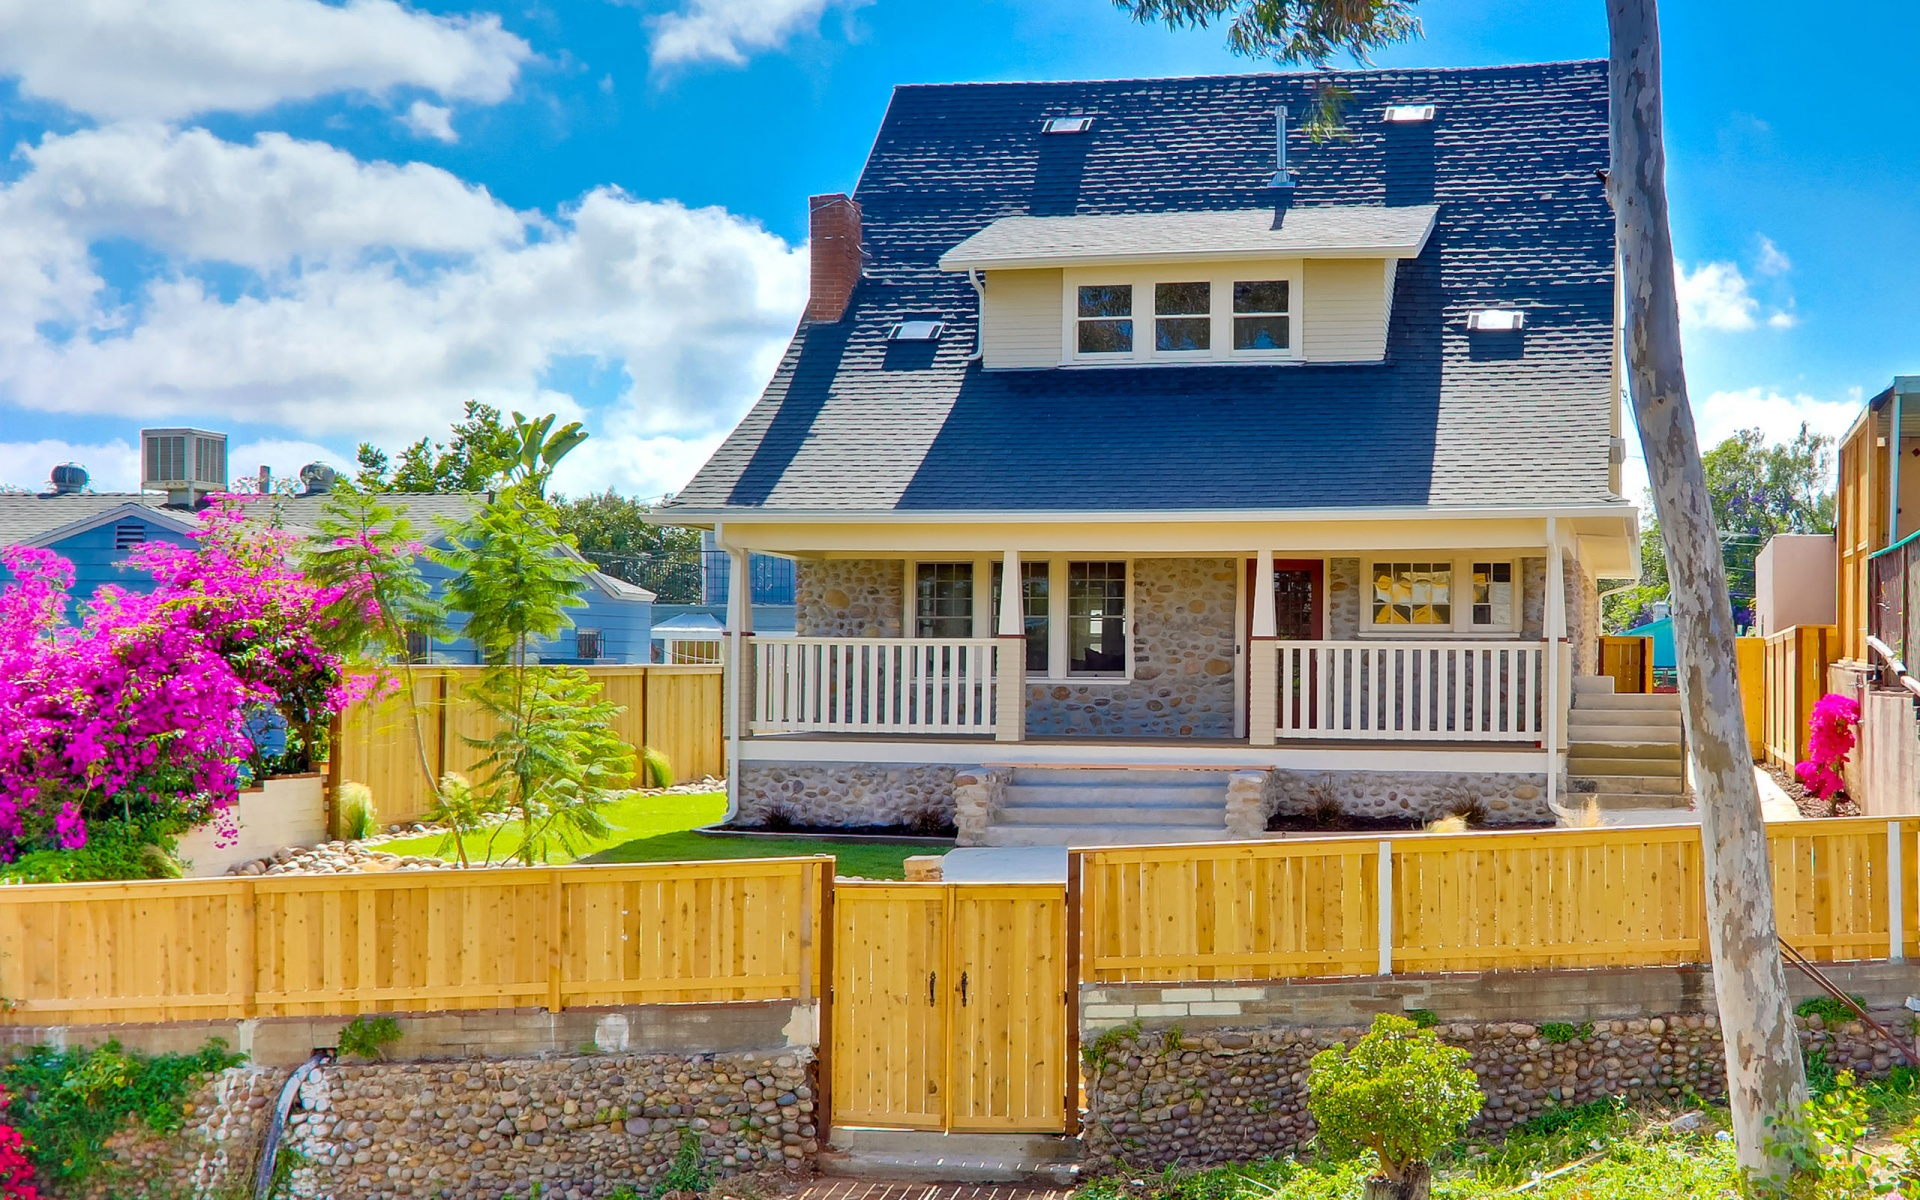 Little House with Garden Wallpaper in 1920x1200 Widescreen